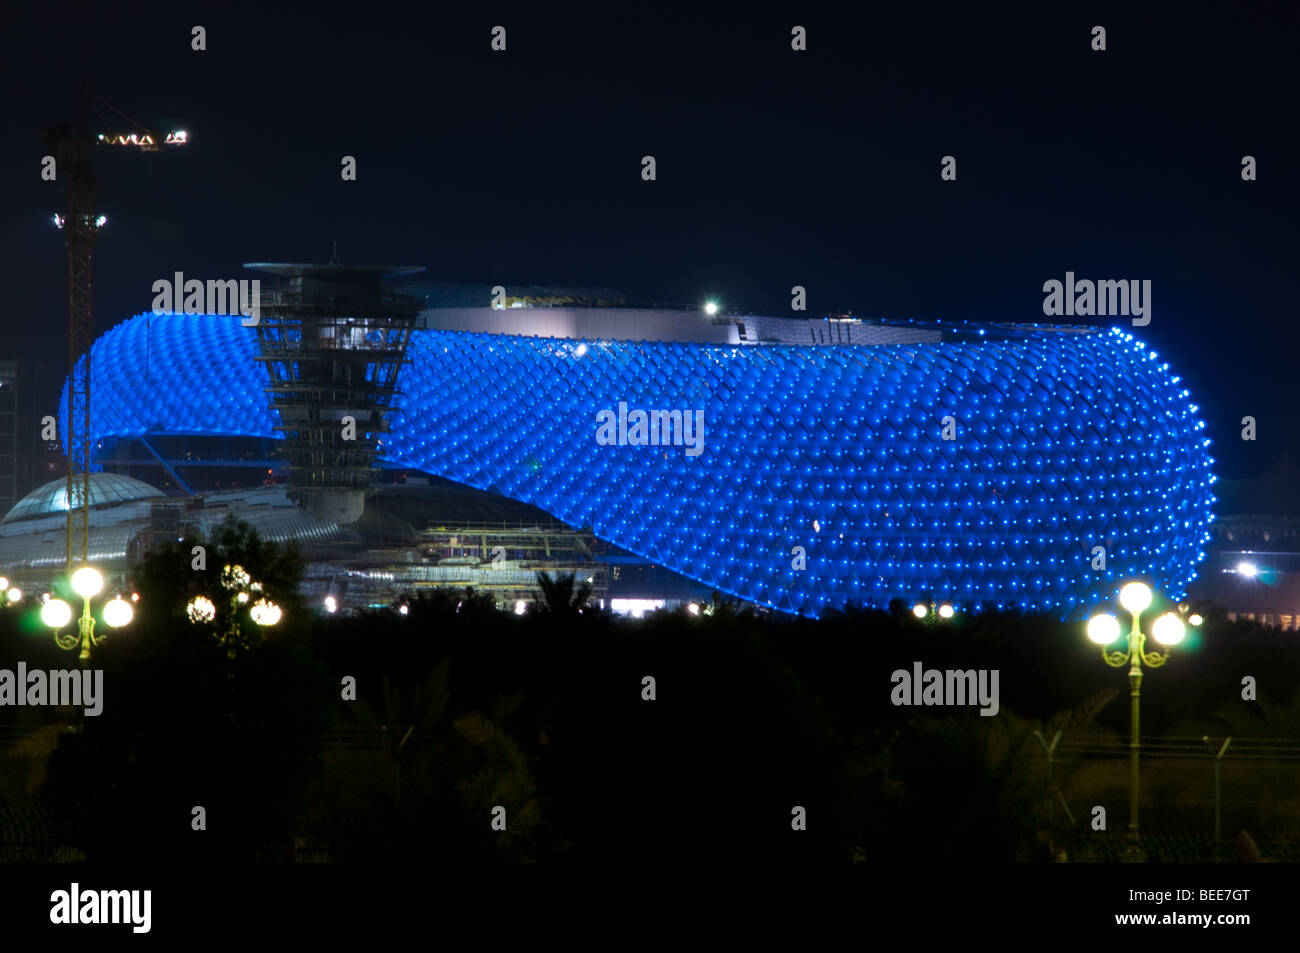 Yas Island Hotel in Abu Dhabi built at the Formula 1 Grand Prix Circuit - Stock Image